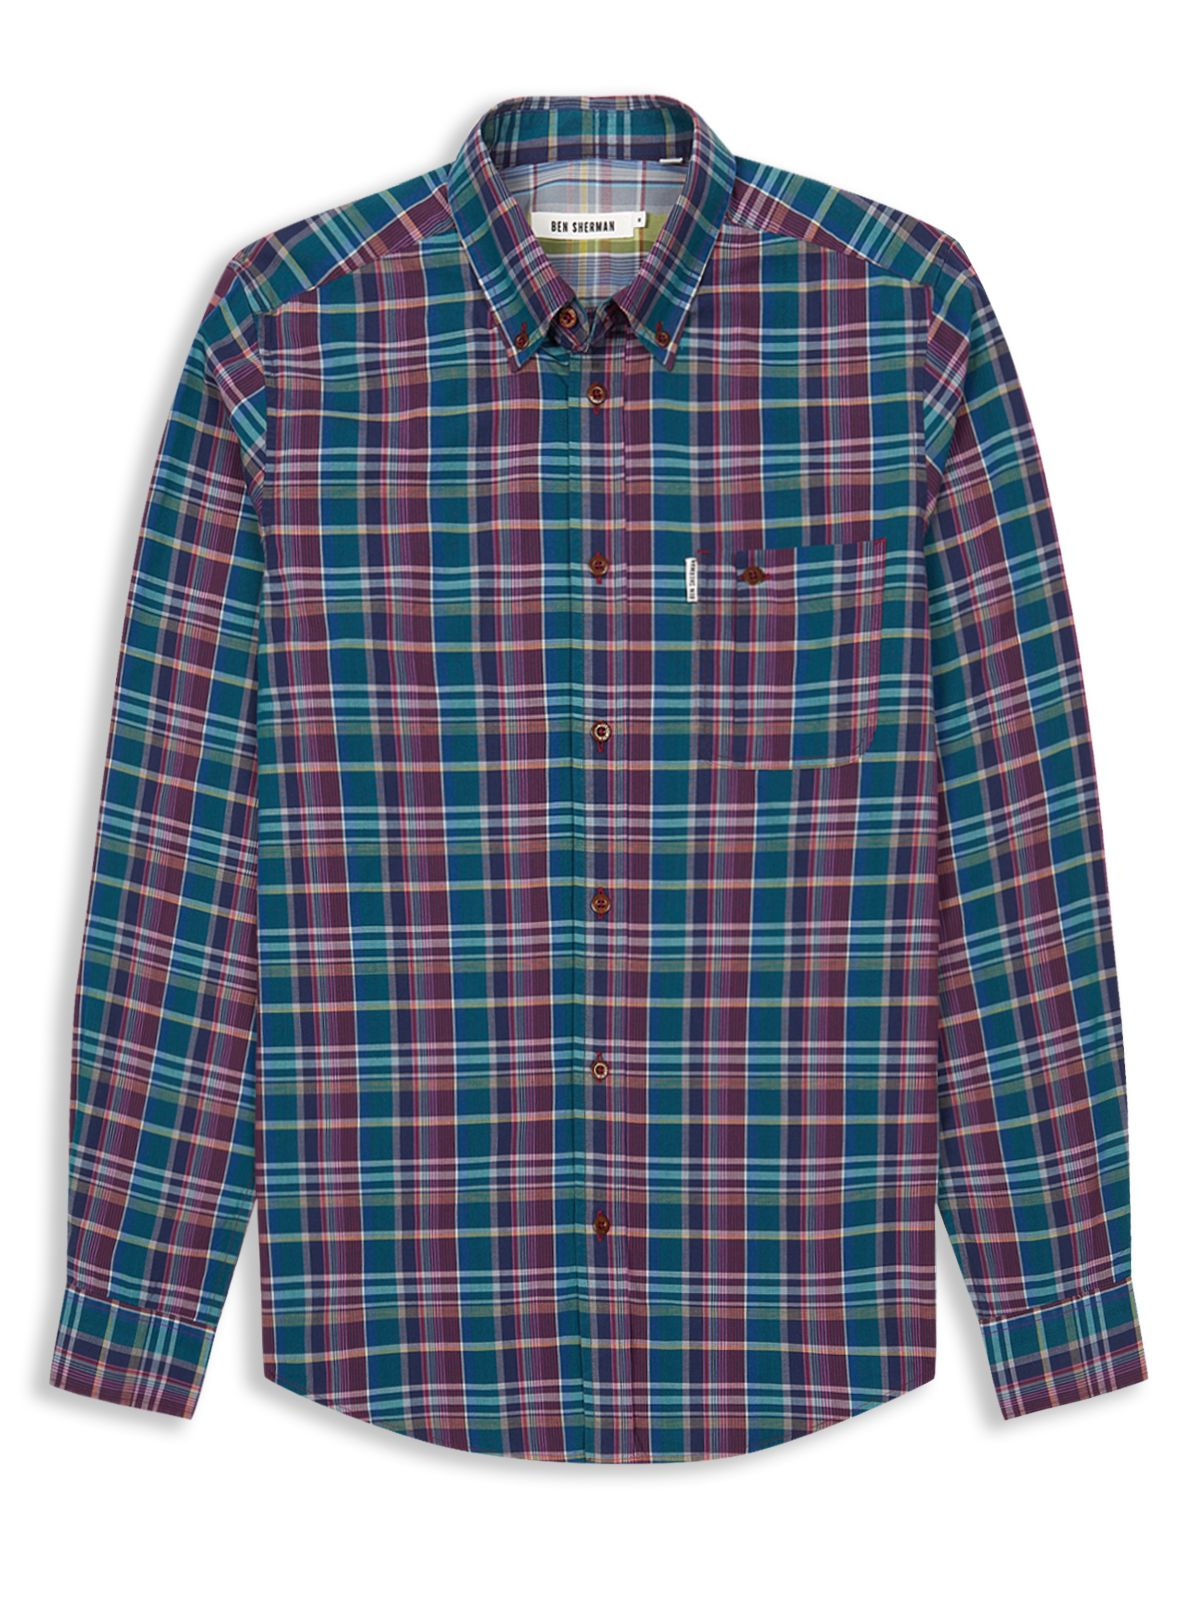 Ben sherman madras check sport shirt in multicolor for men for Mens madras shirt sale